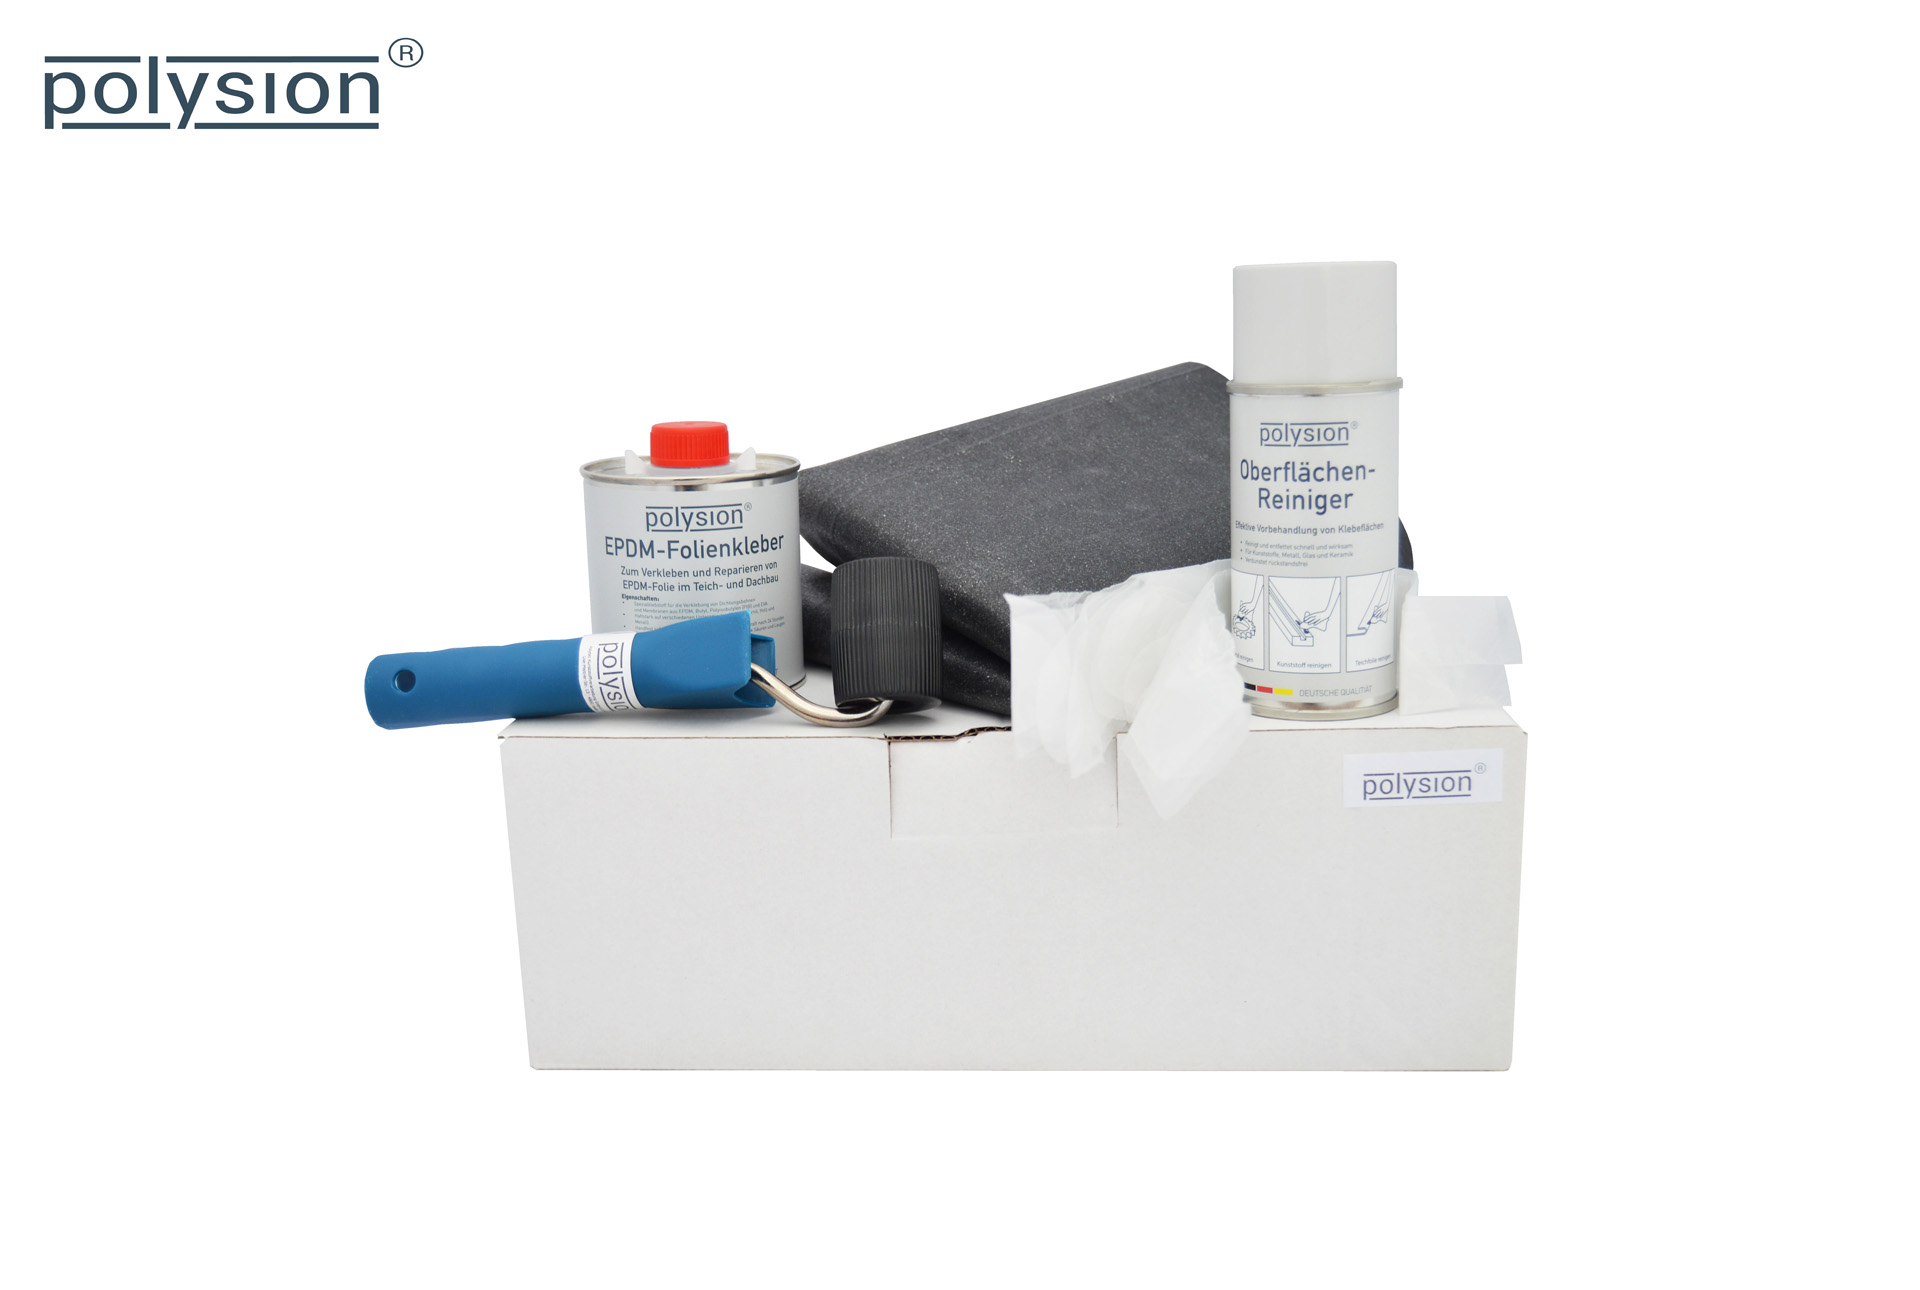 Polysion® Reparaturset EPDM Teichfolie